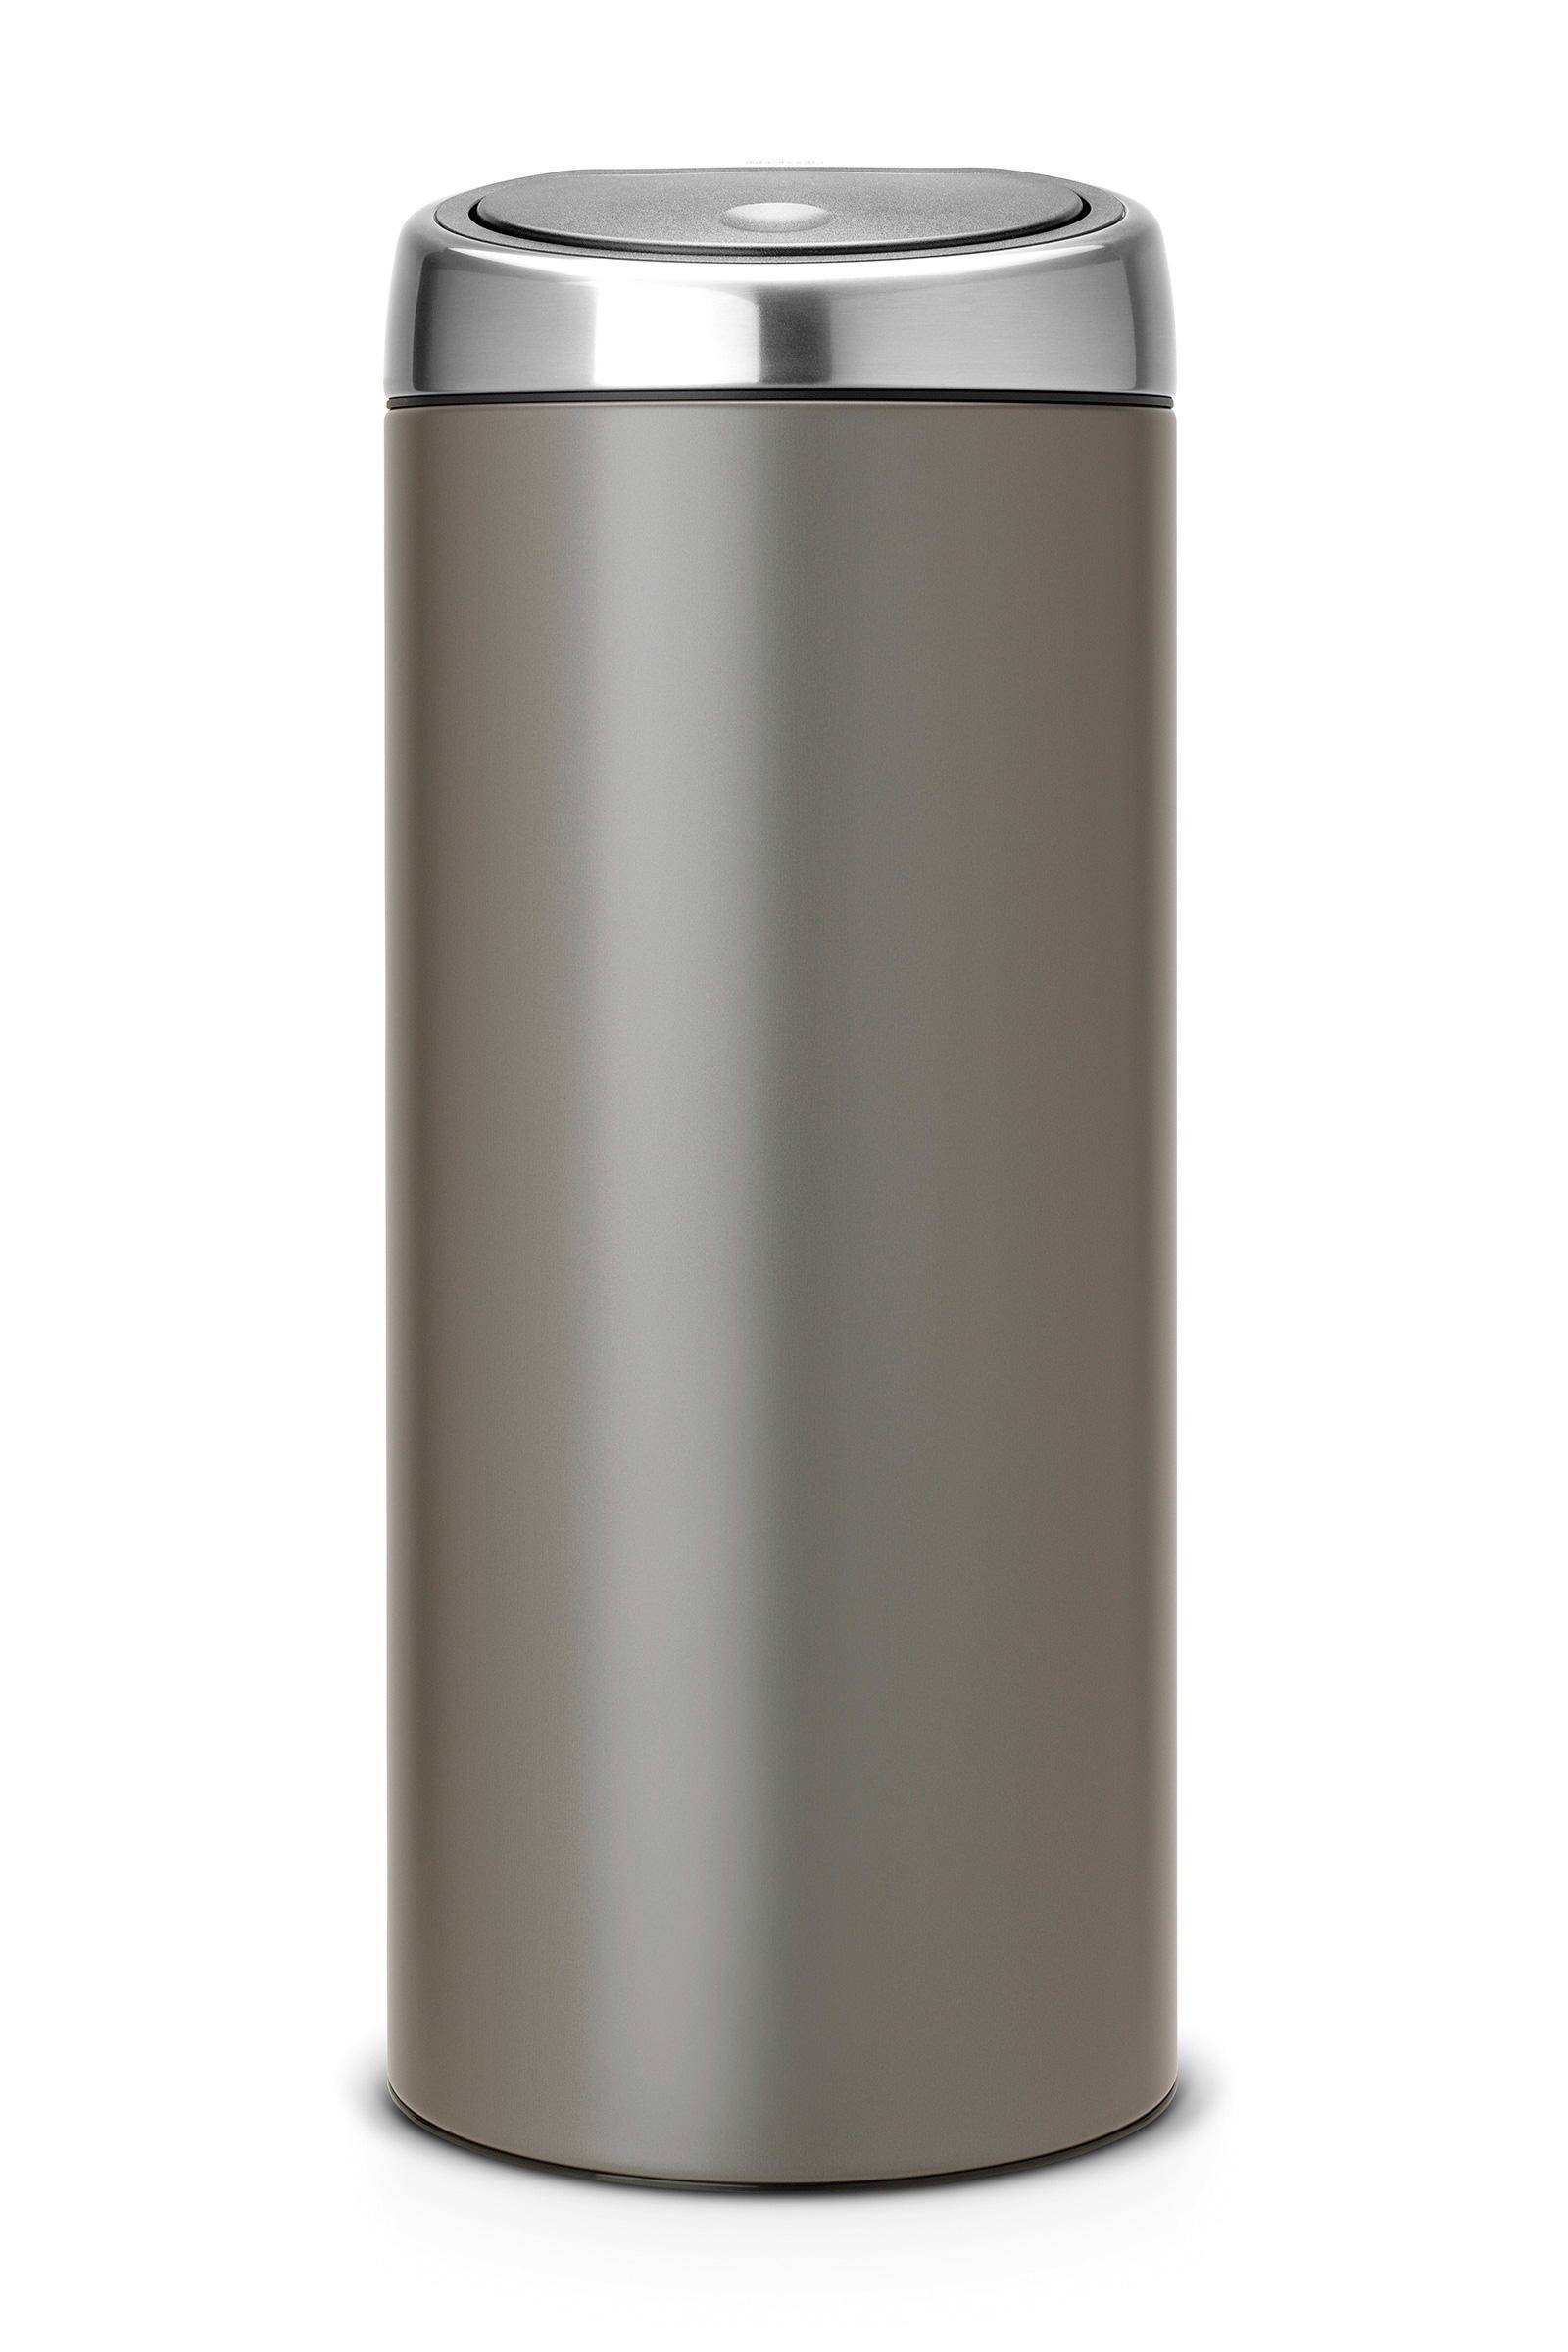 Brabantia 30 Liter Prullenbak.Touch Bin 30 Liter Prullenbak